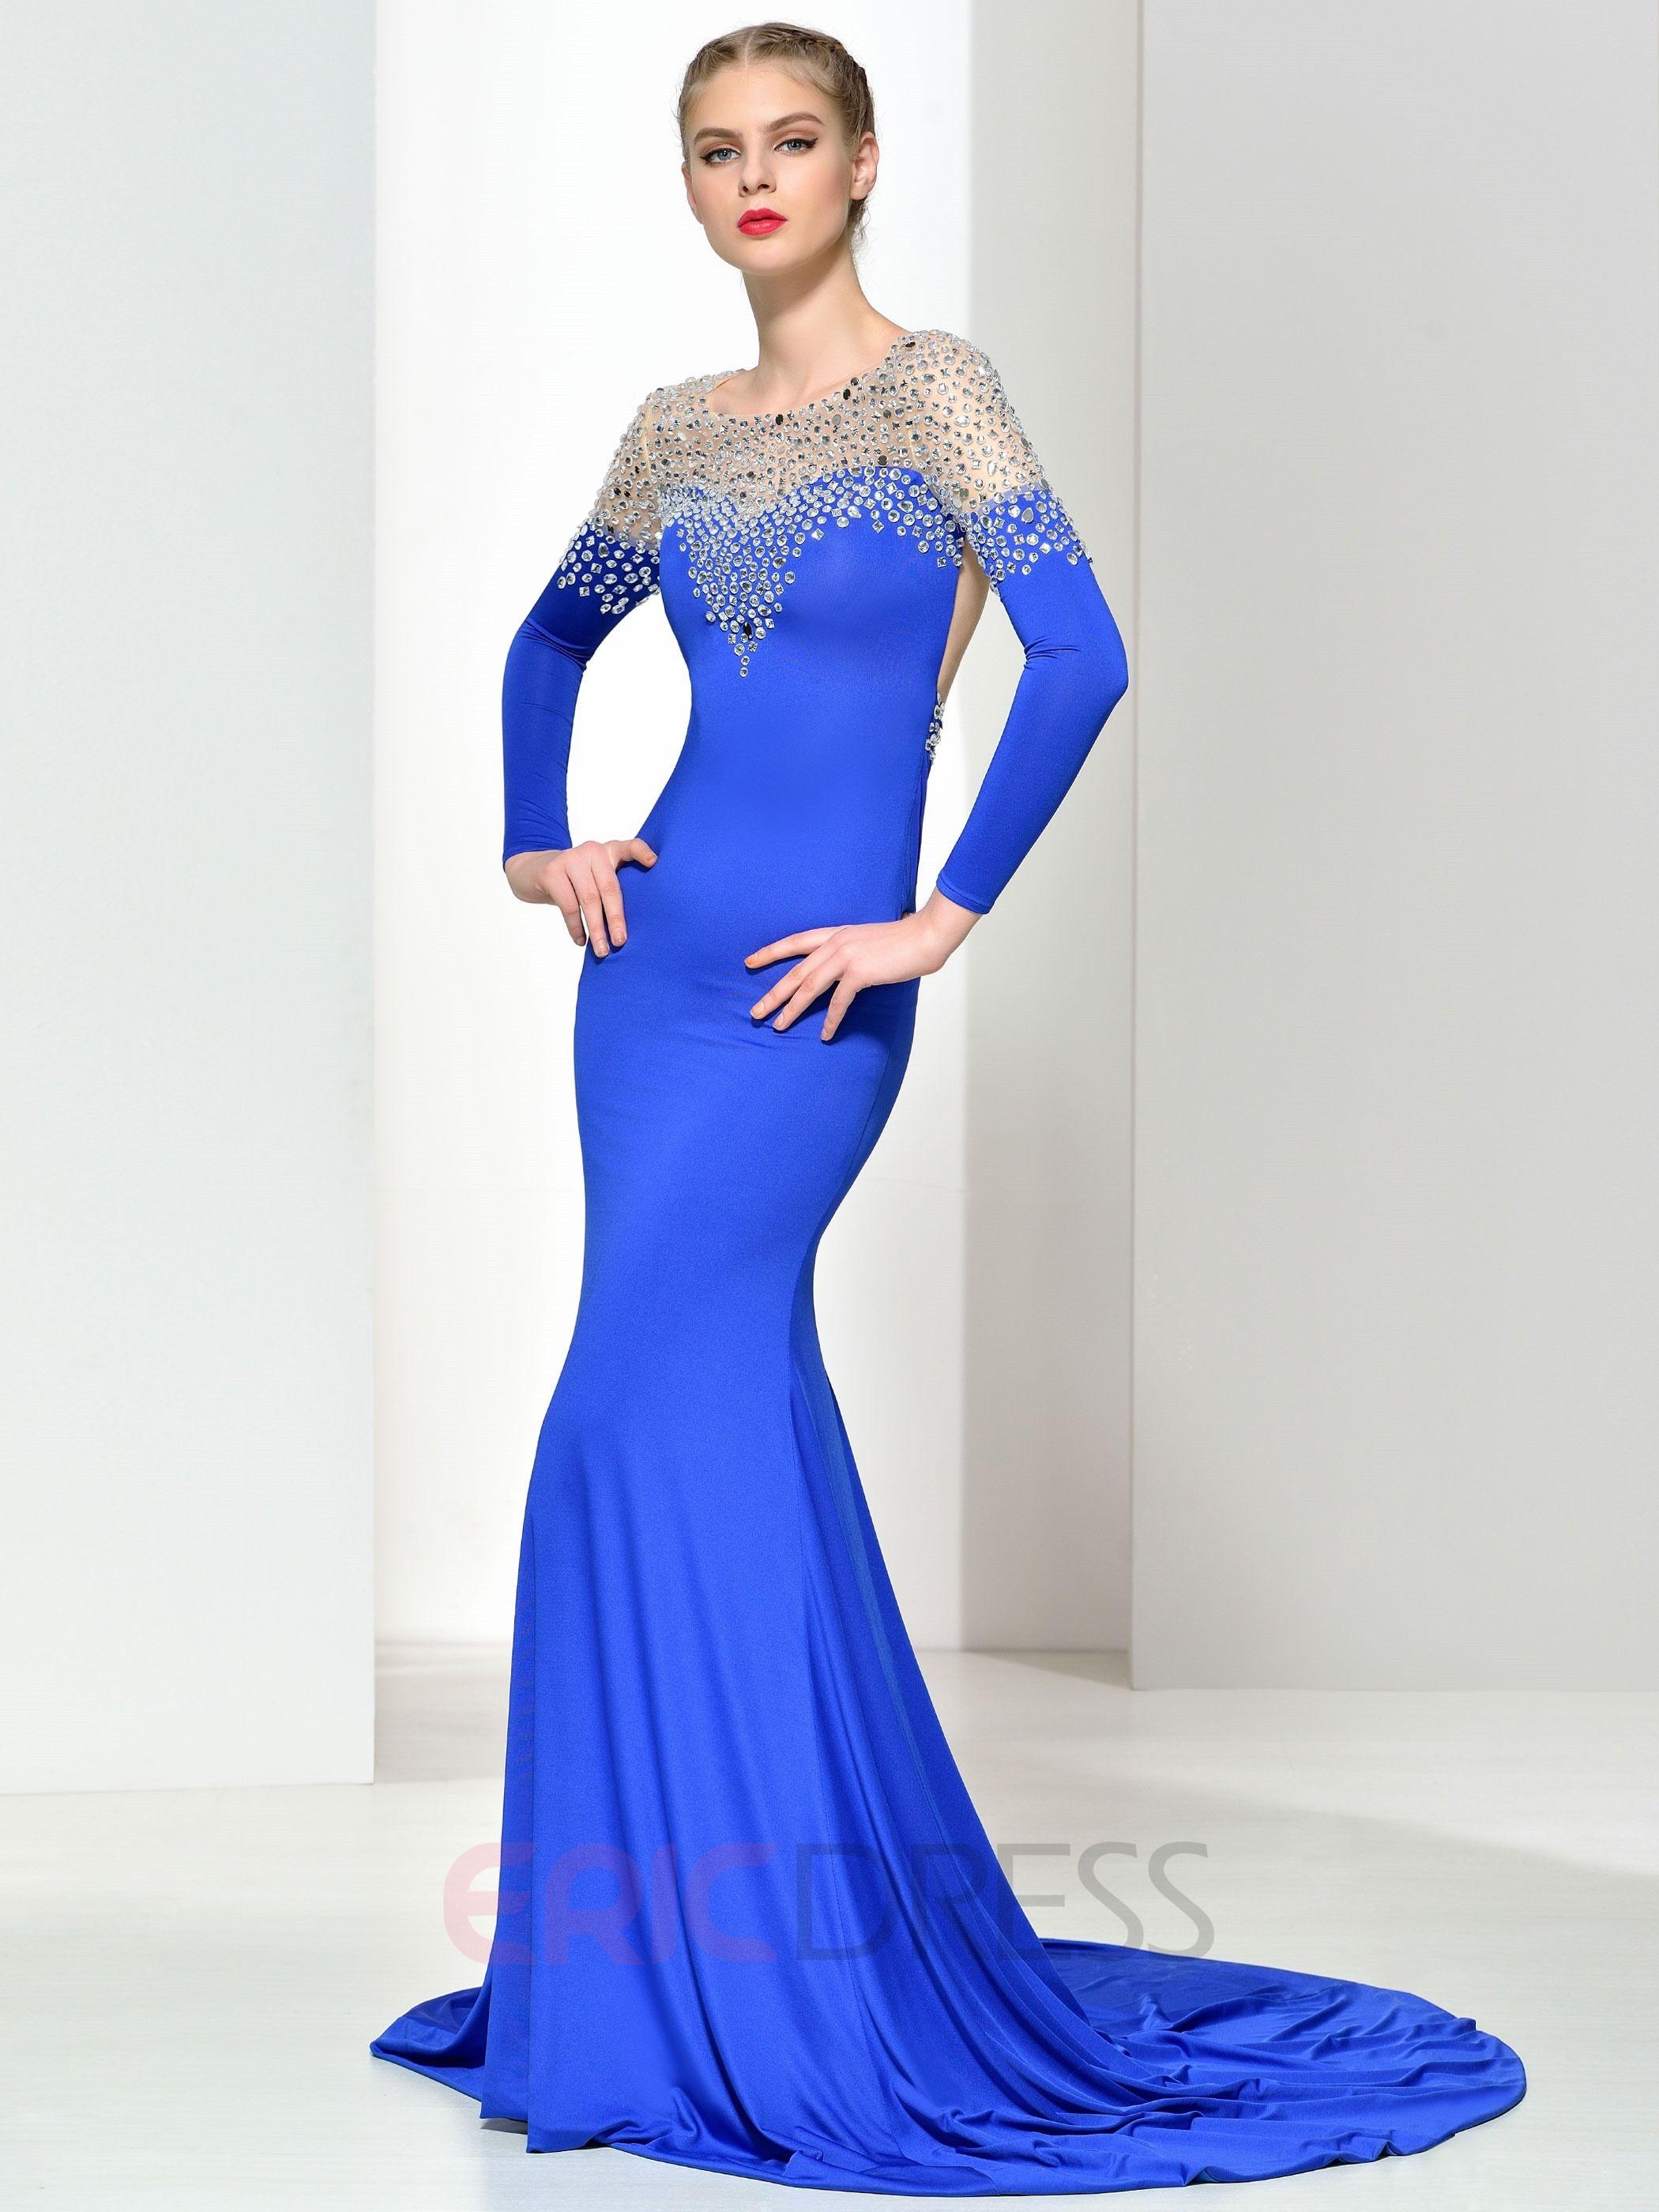 f8f47023cd8 Ericdress Long Sleeves Beading Backless Mermaid Evening Dress 3 ...